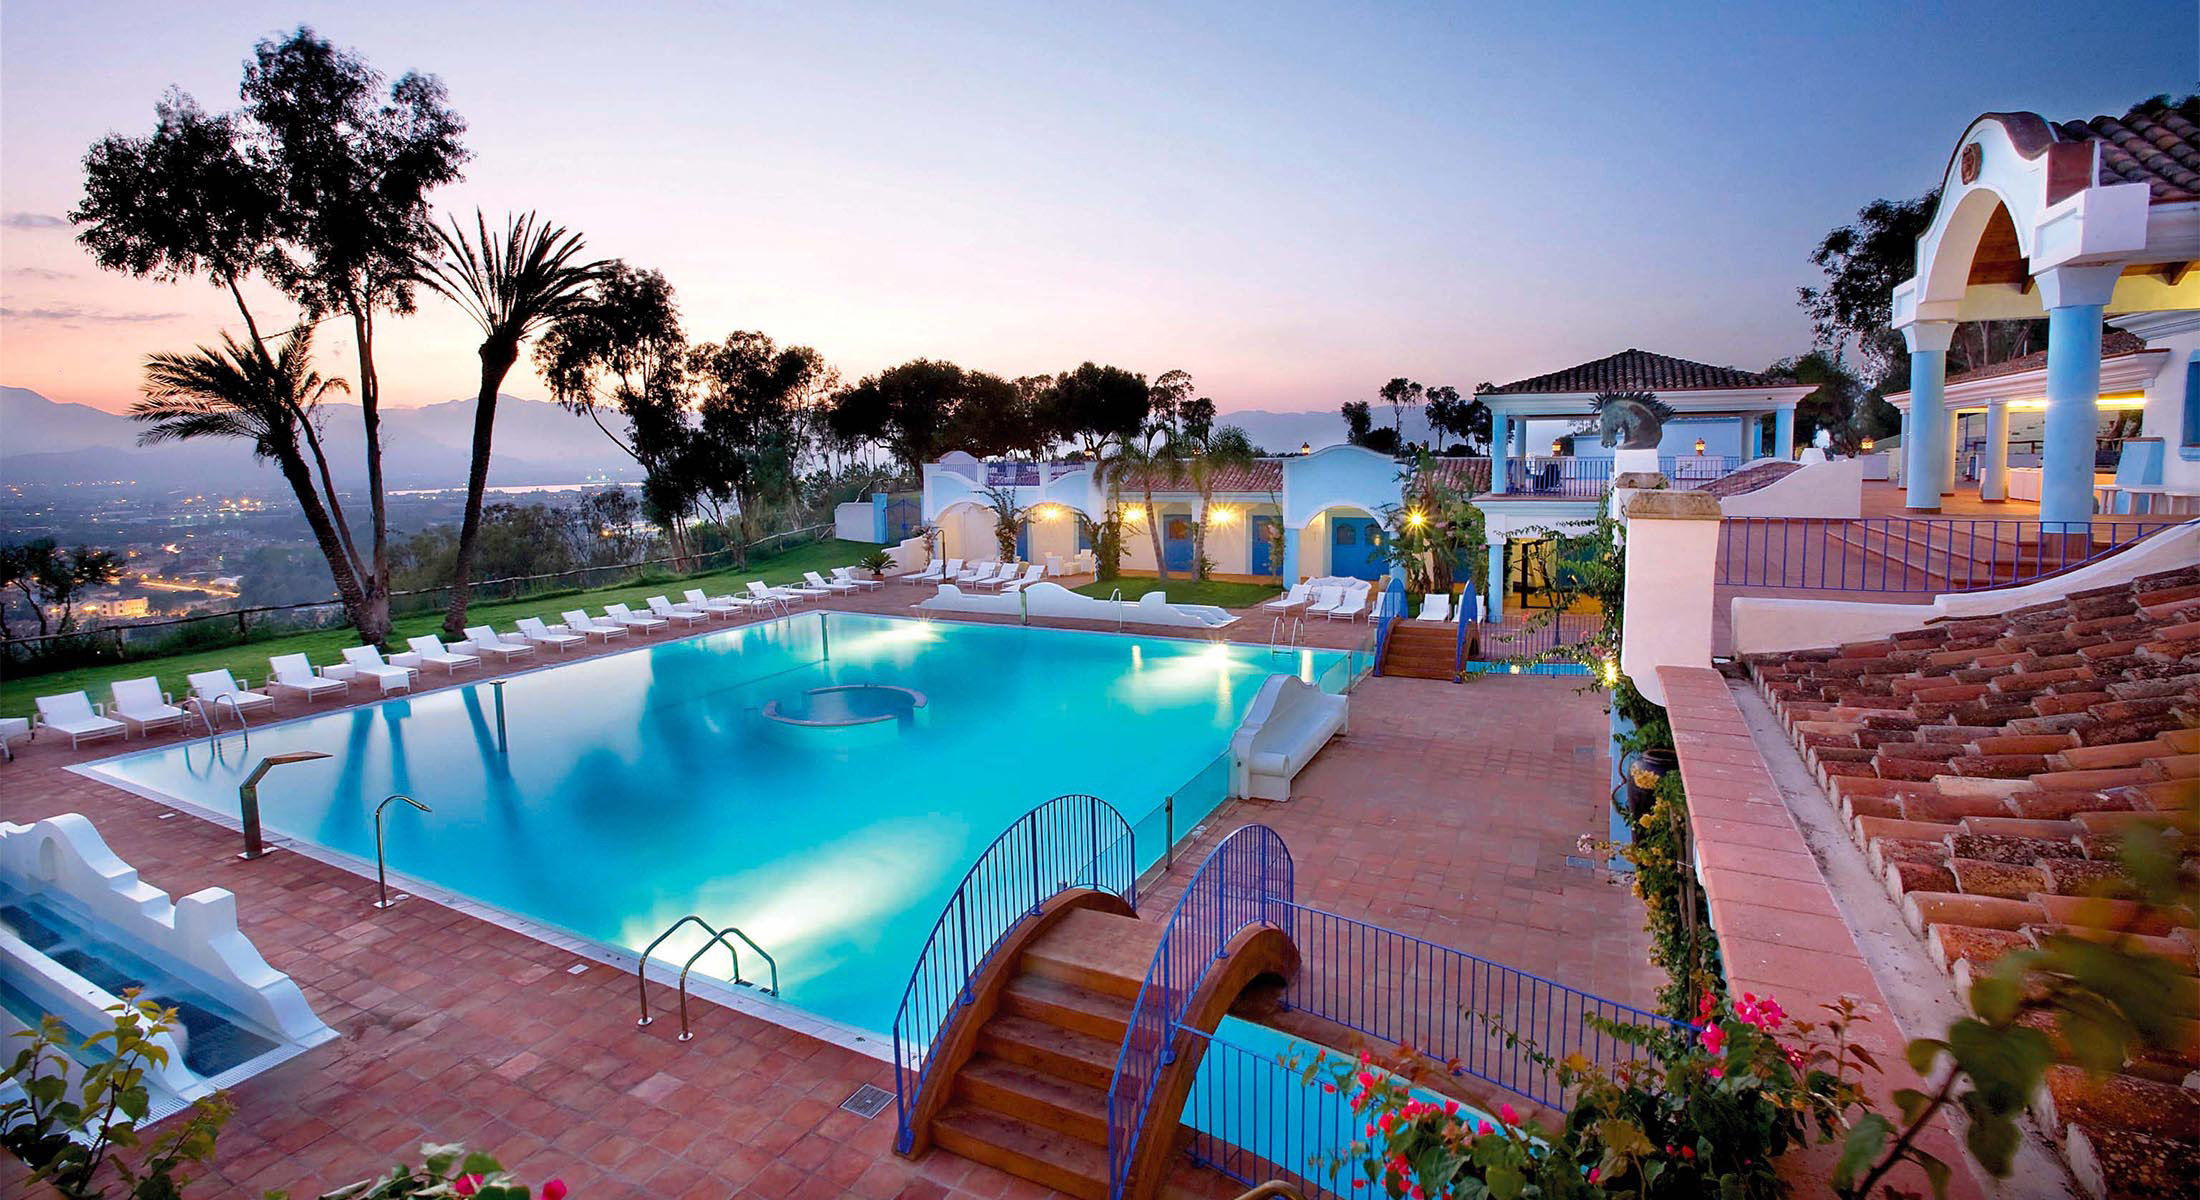 sky leisure swimming pool property Resort Water park amusement park Villa Pool